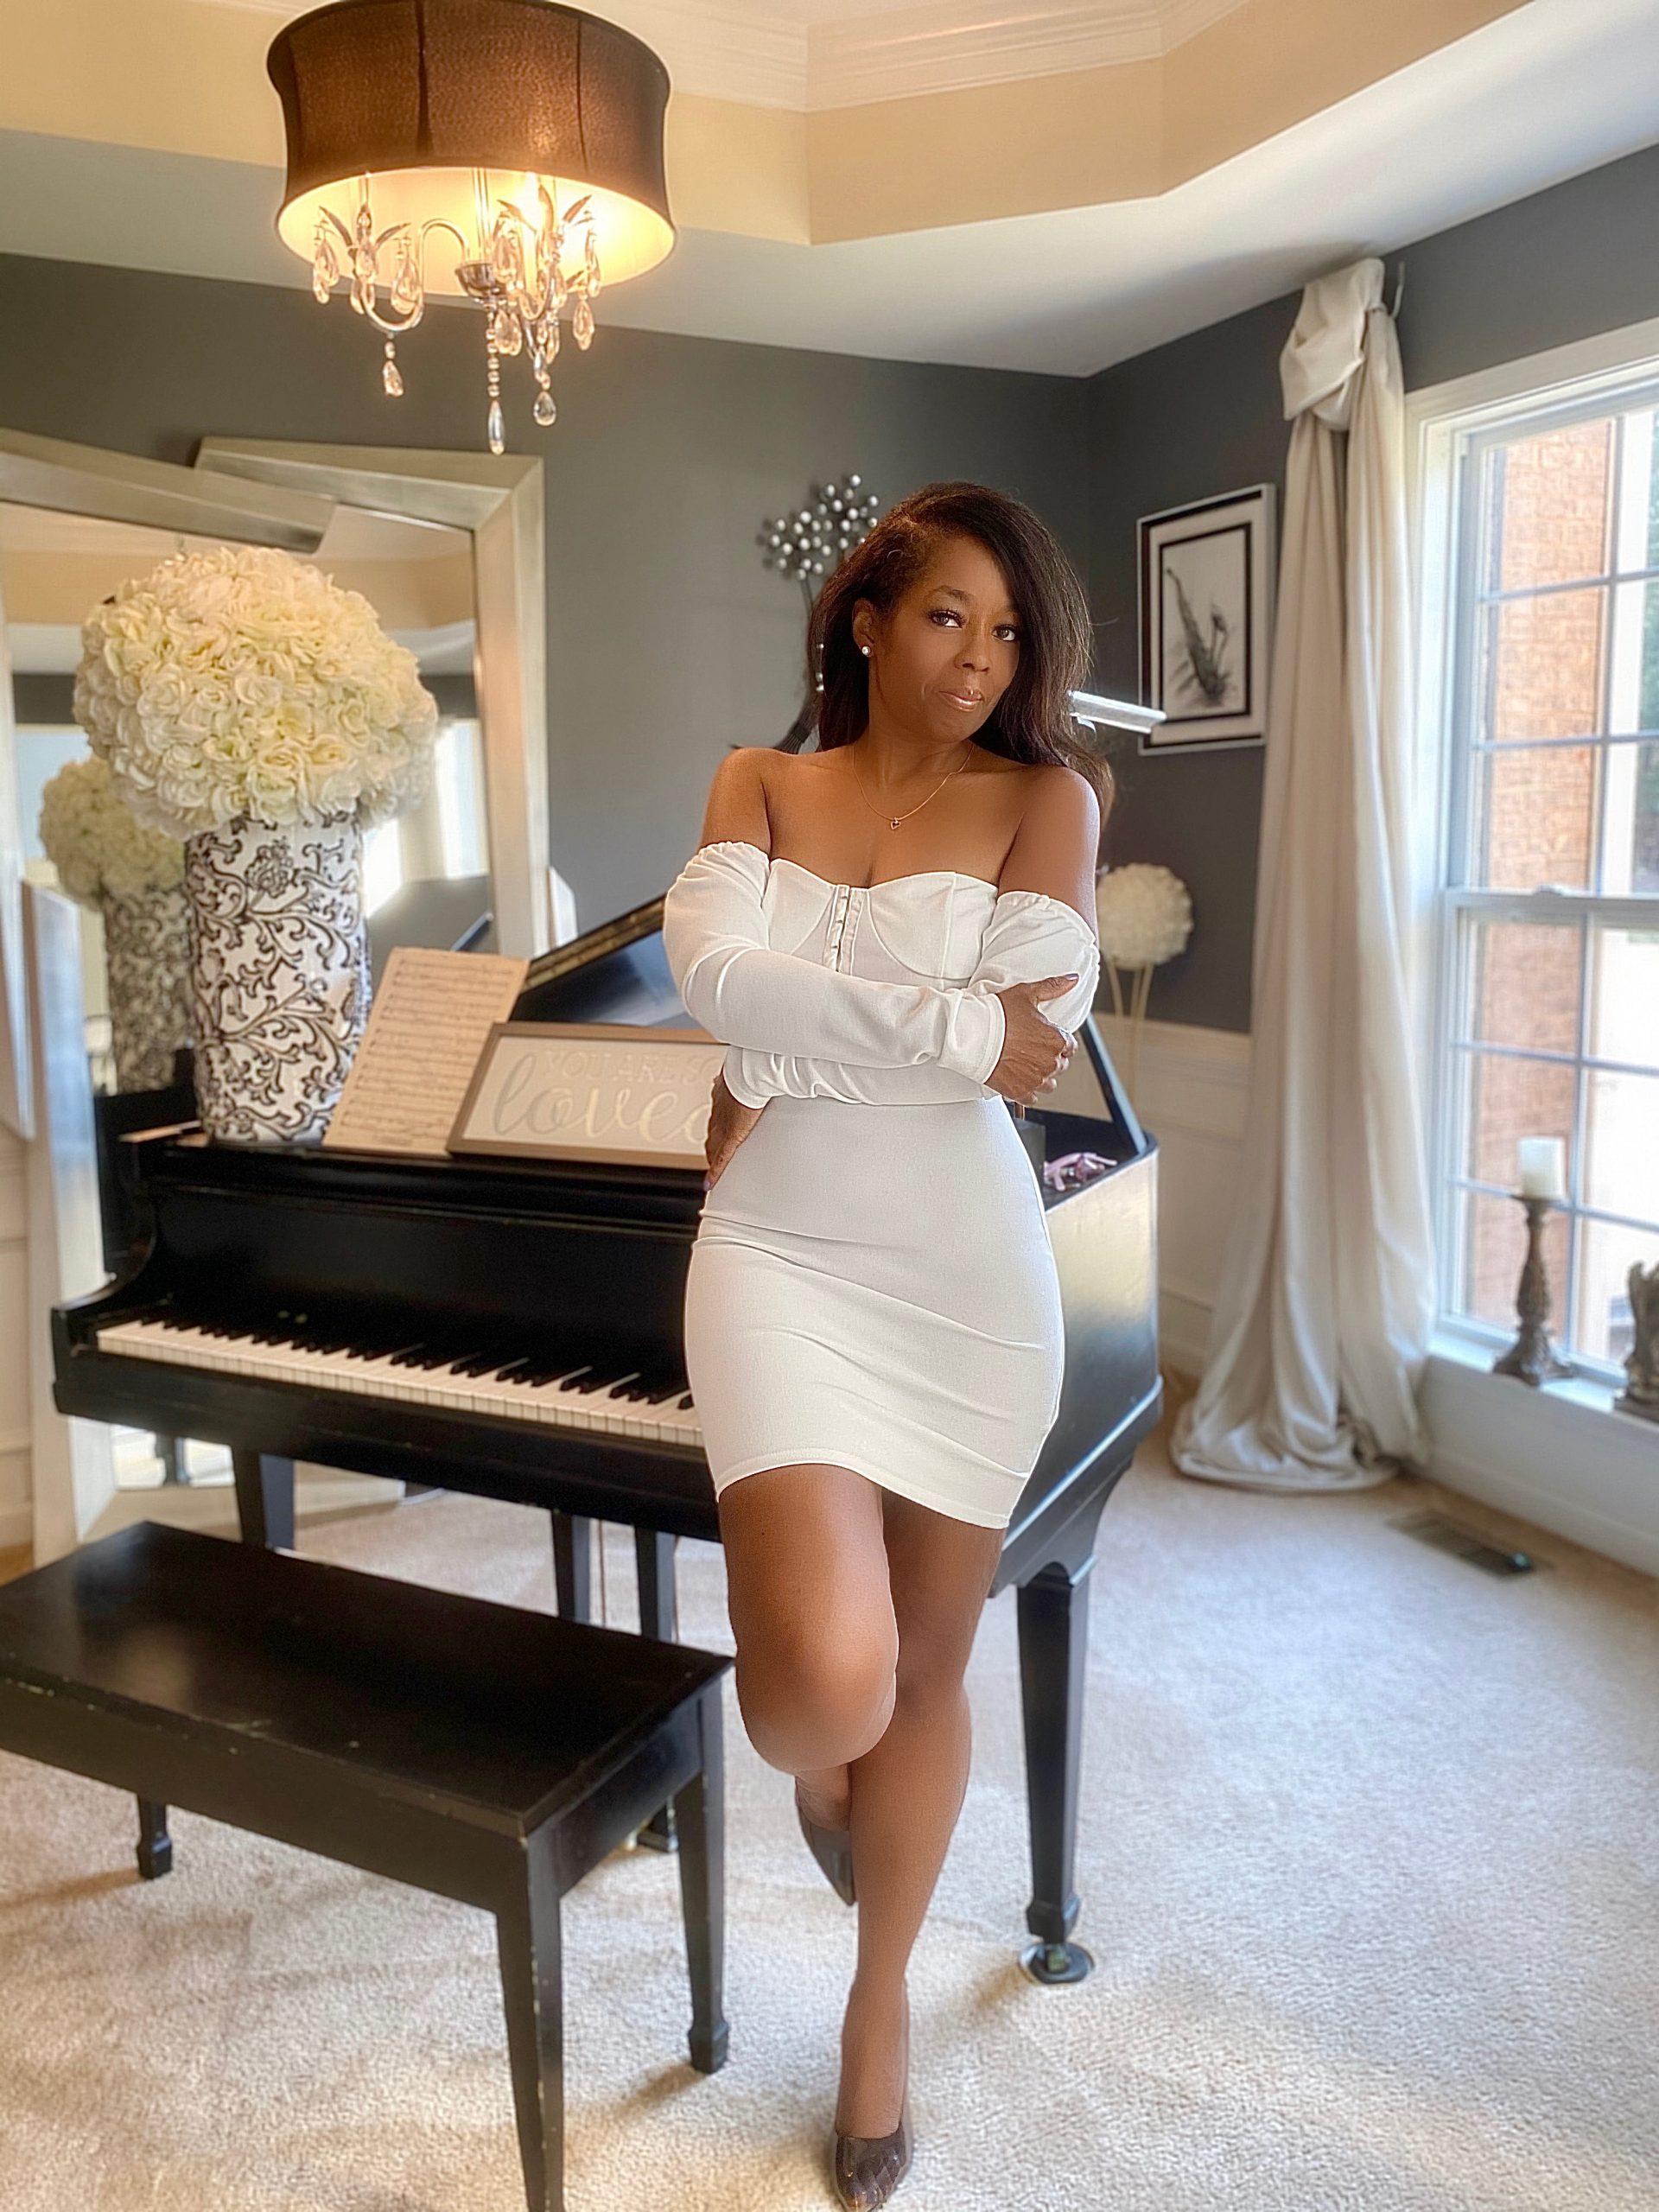 My Style: White Milkmaid Bodycon Mini Dress